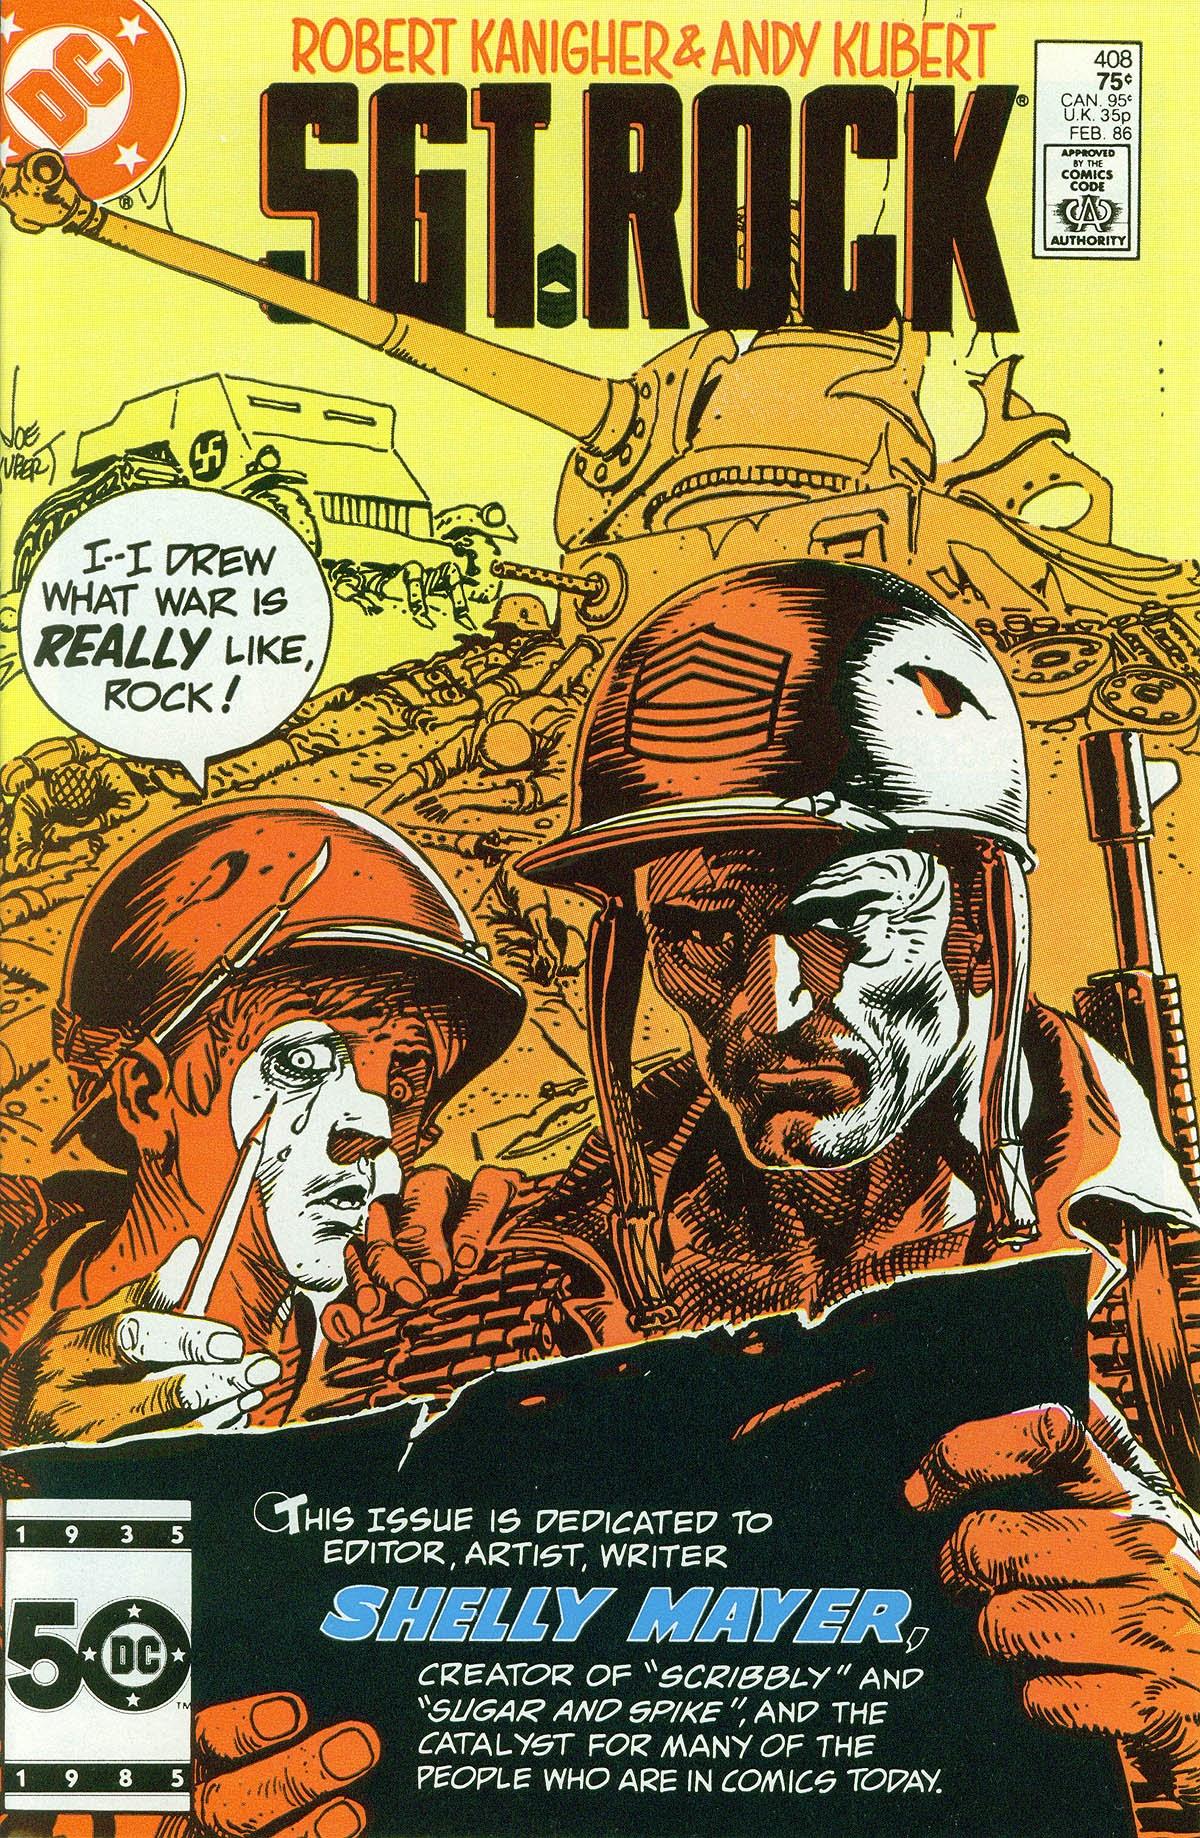 Read online Sgt. Rock comic -  Issue #408 - 1